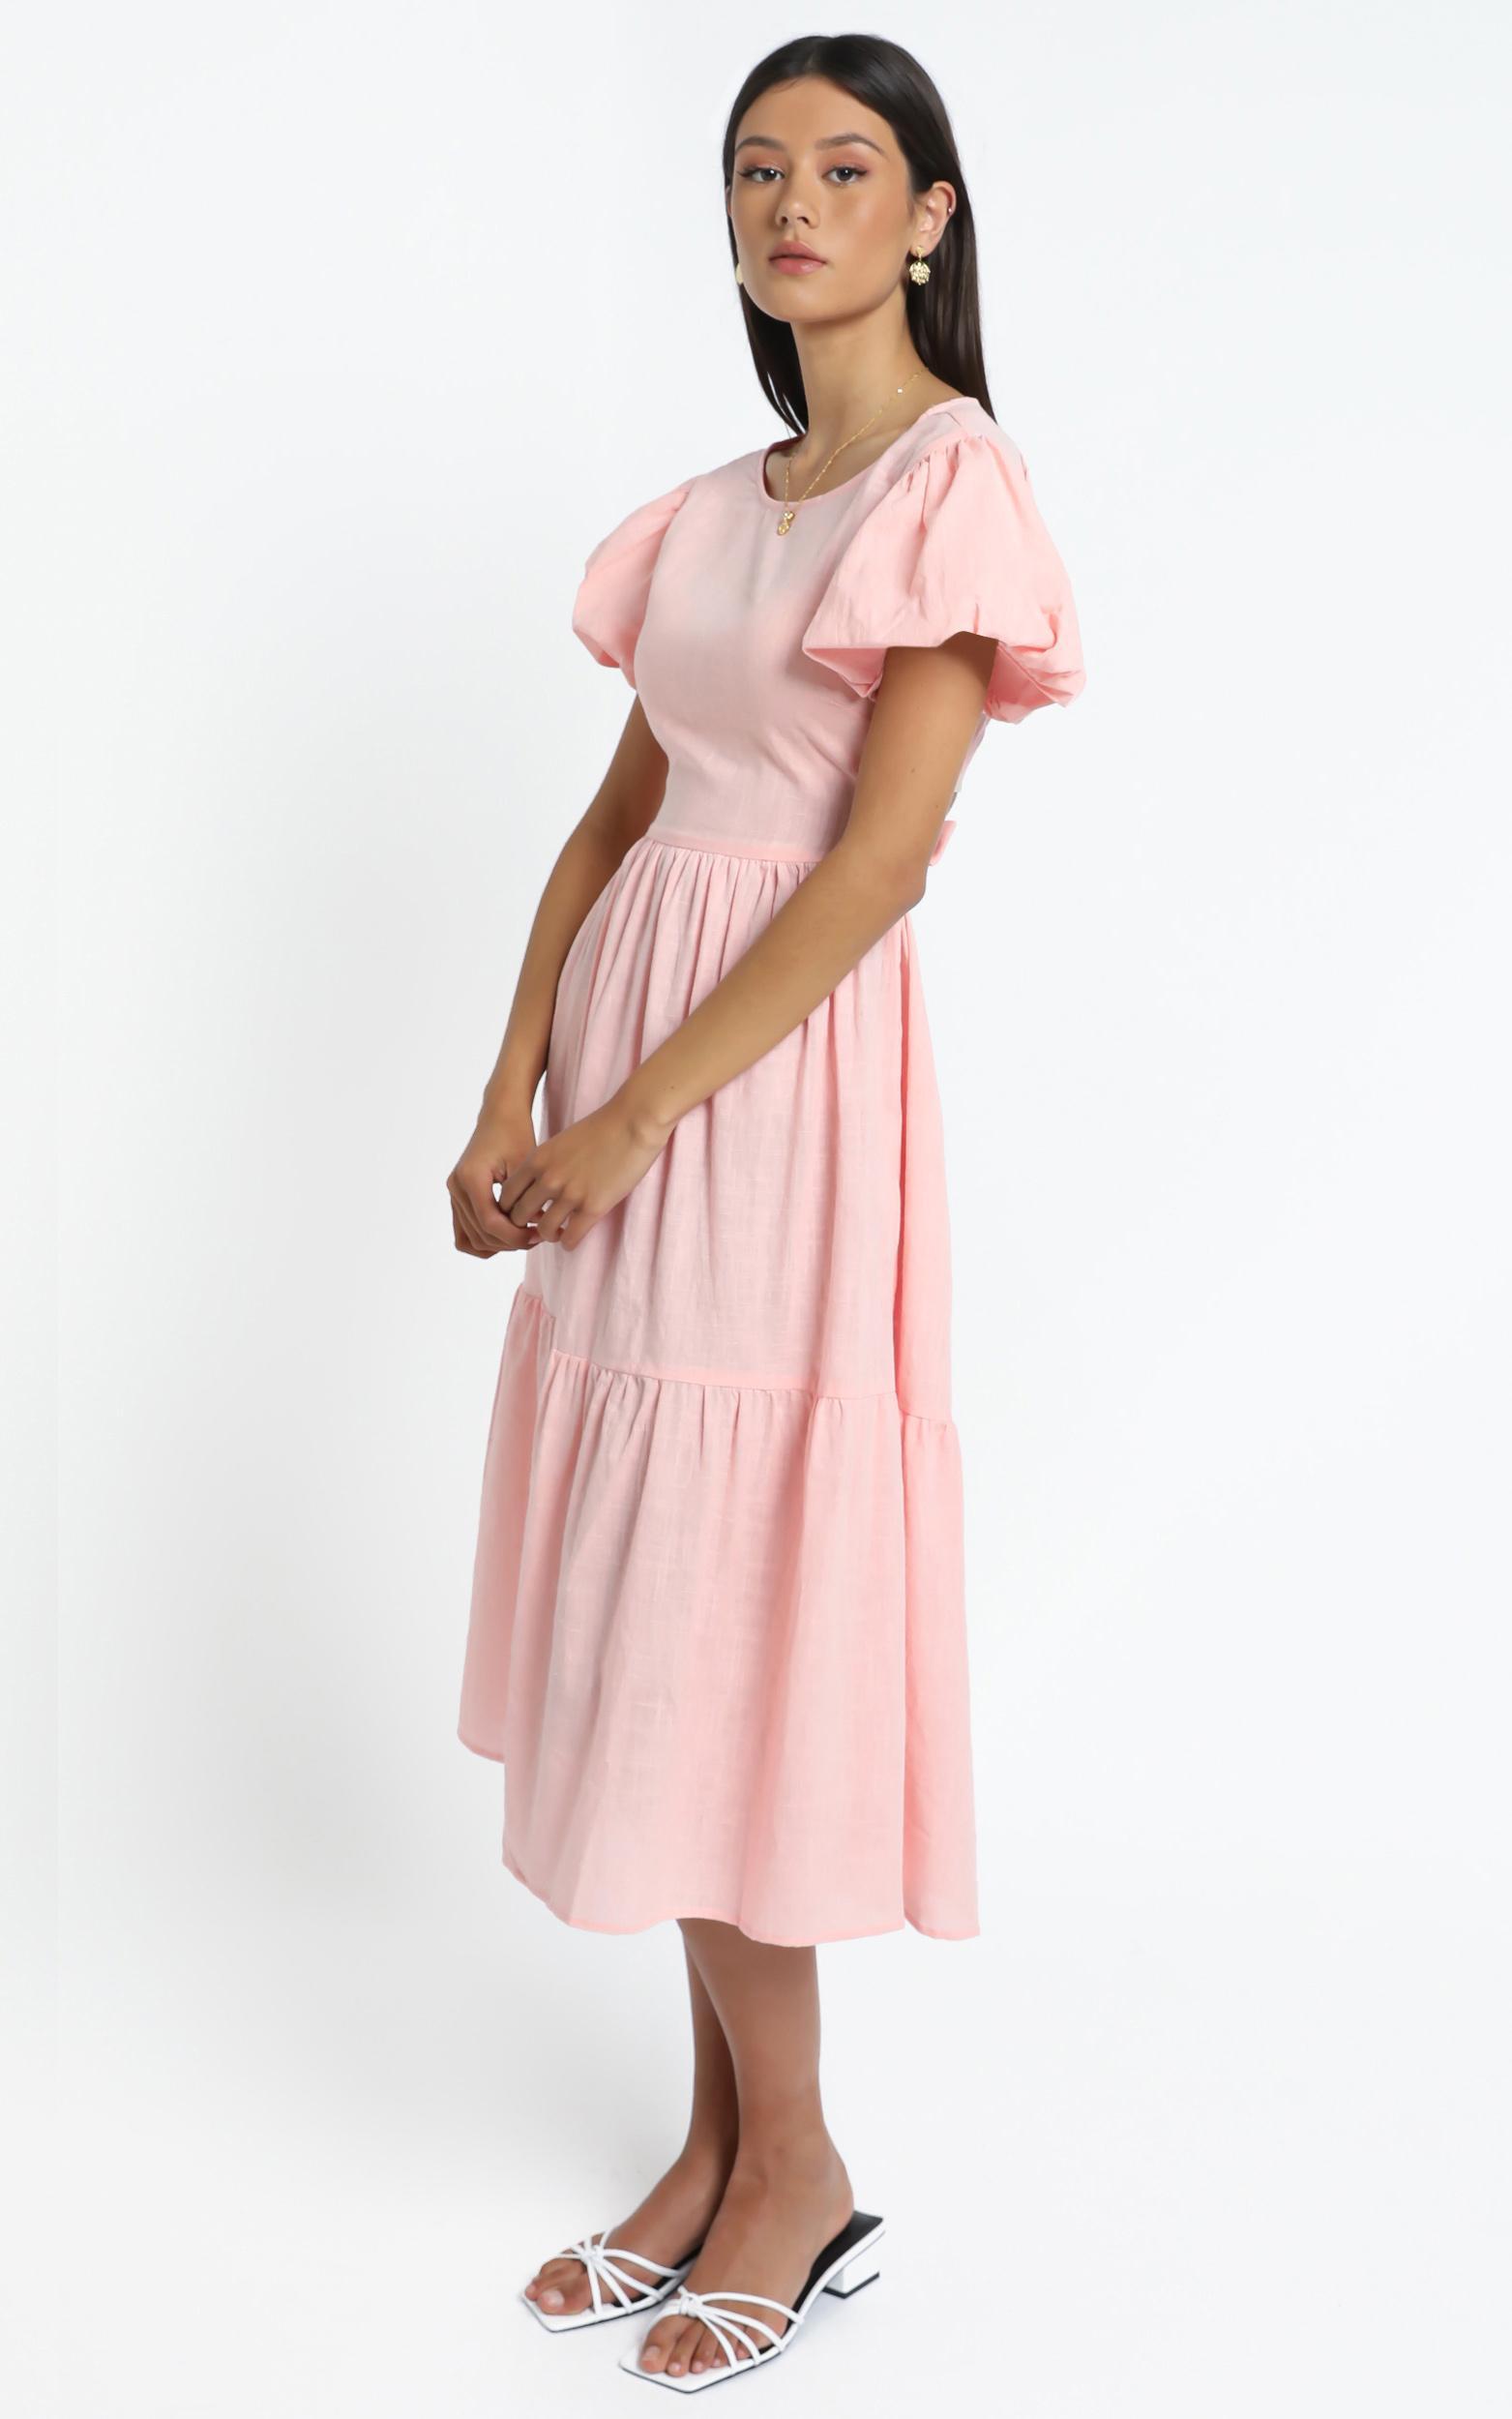 Raelynn Dress in Pink - 14 (XL), Pink, hi-res image number null